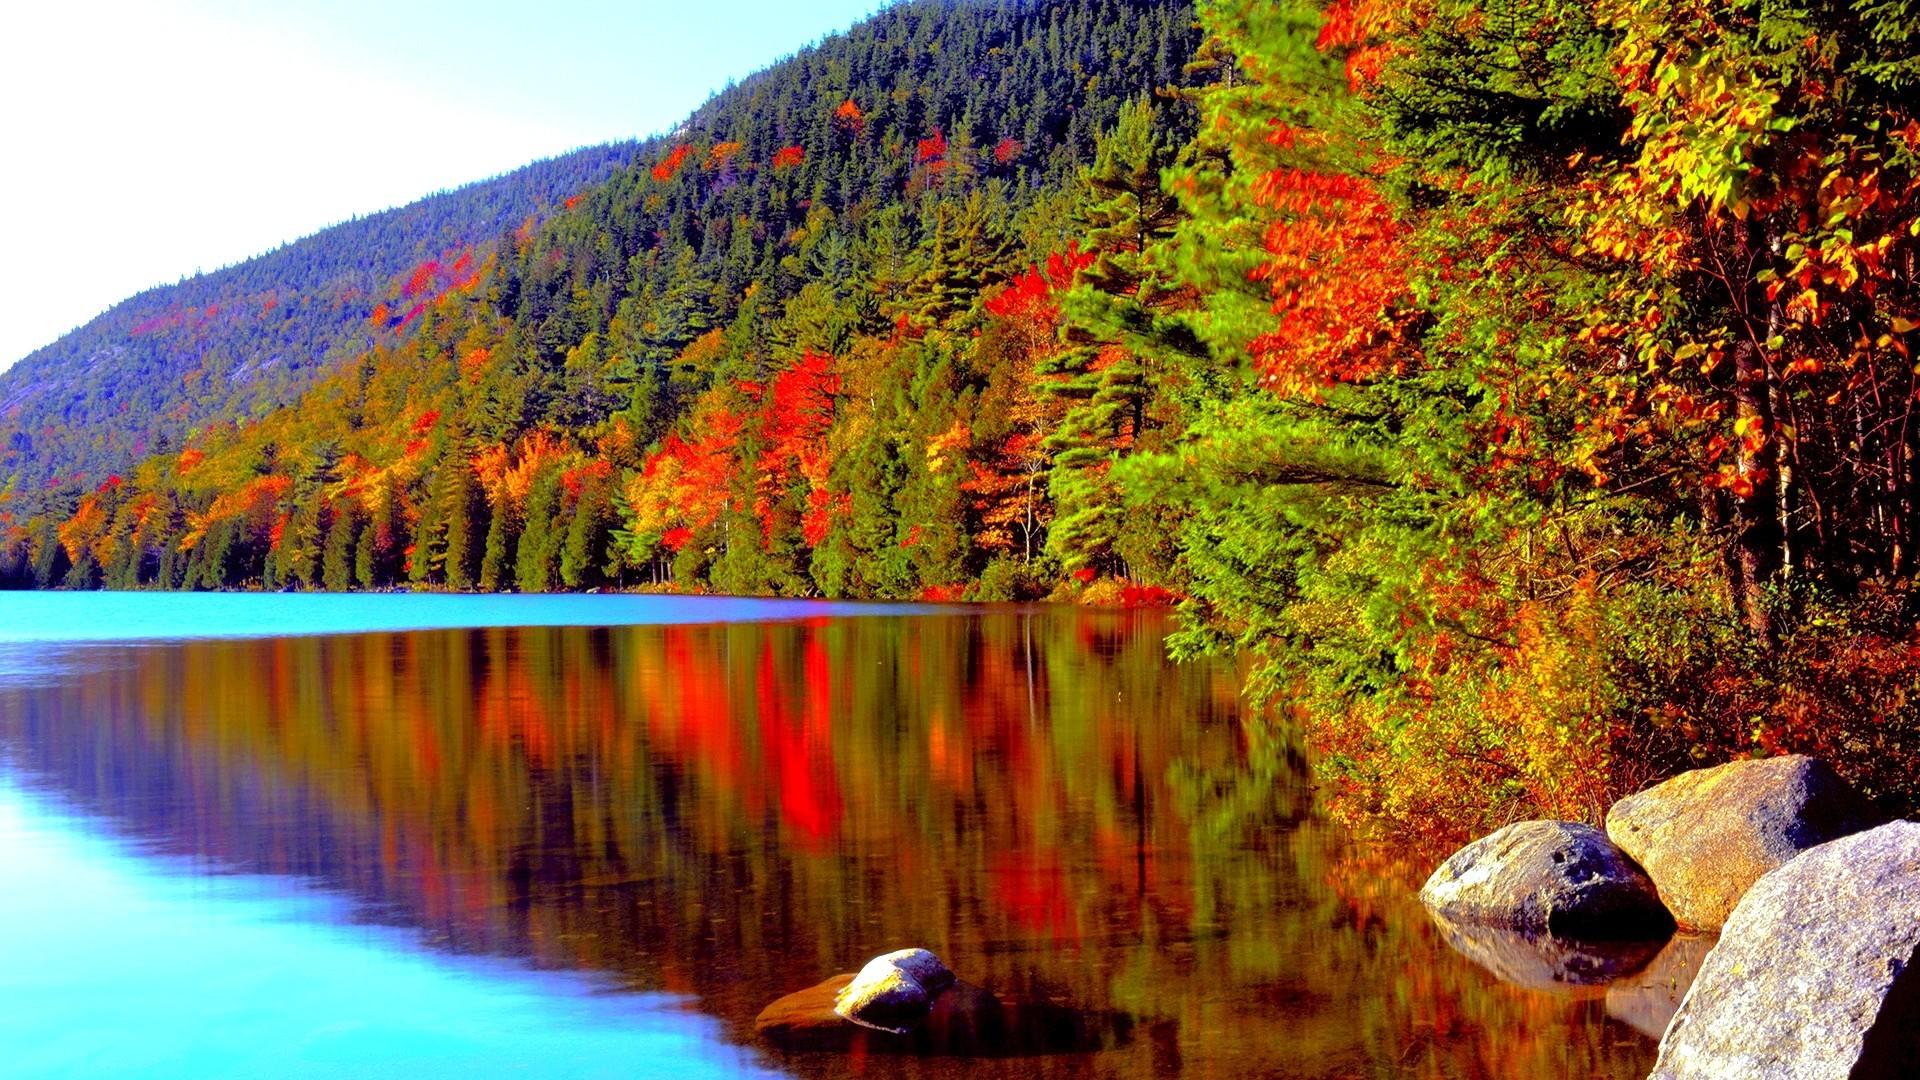 LAKE AUTUMN Forest Foliage Conifer Fall Color Acadia National Park Crater  Desktop Backgrounds Detail